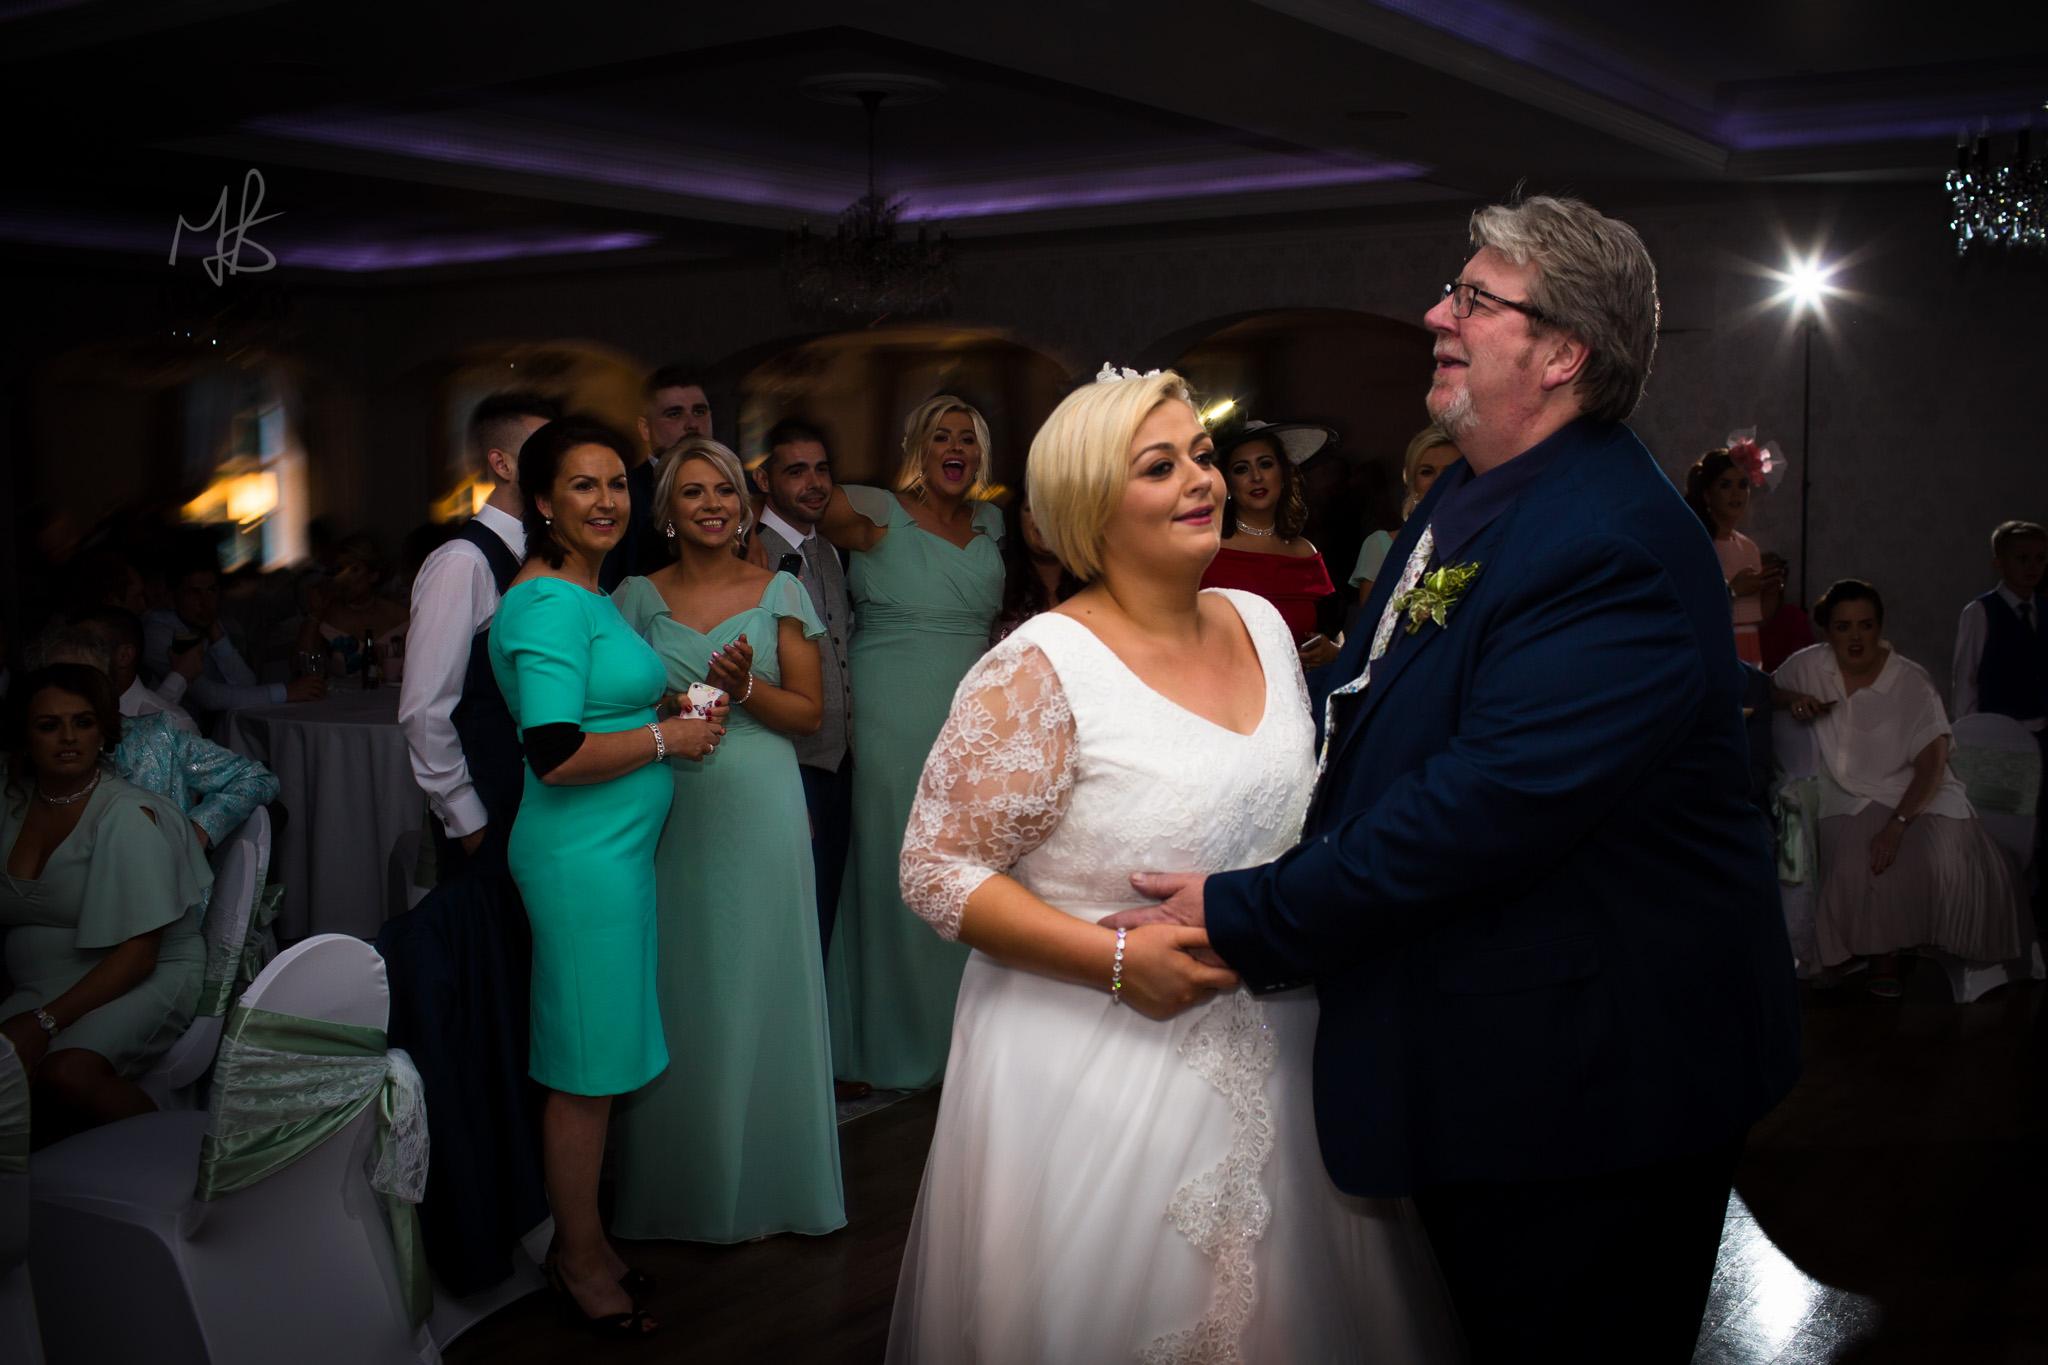 Northern-Ireland-Wedding-Photographer-Mark-Barnes-Ballymena_wedding-photography-Leighinmohr-House-Seamas_Alanna_For-web-60.jpg